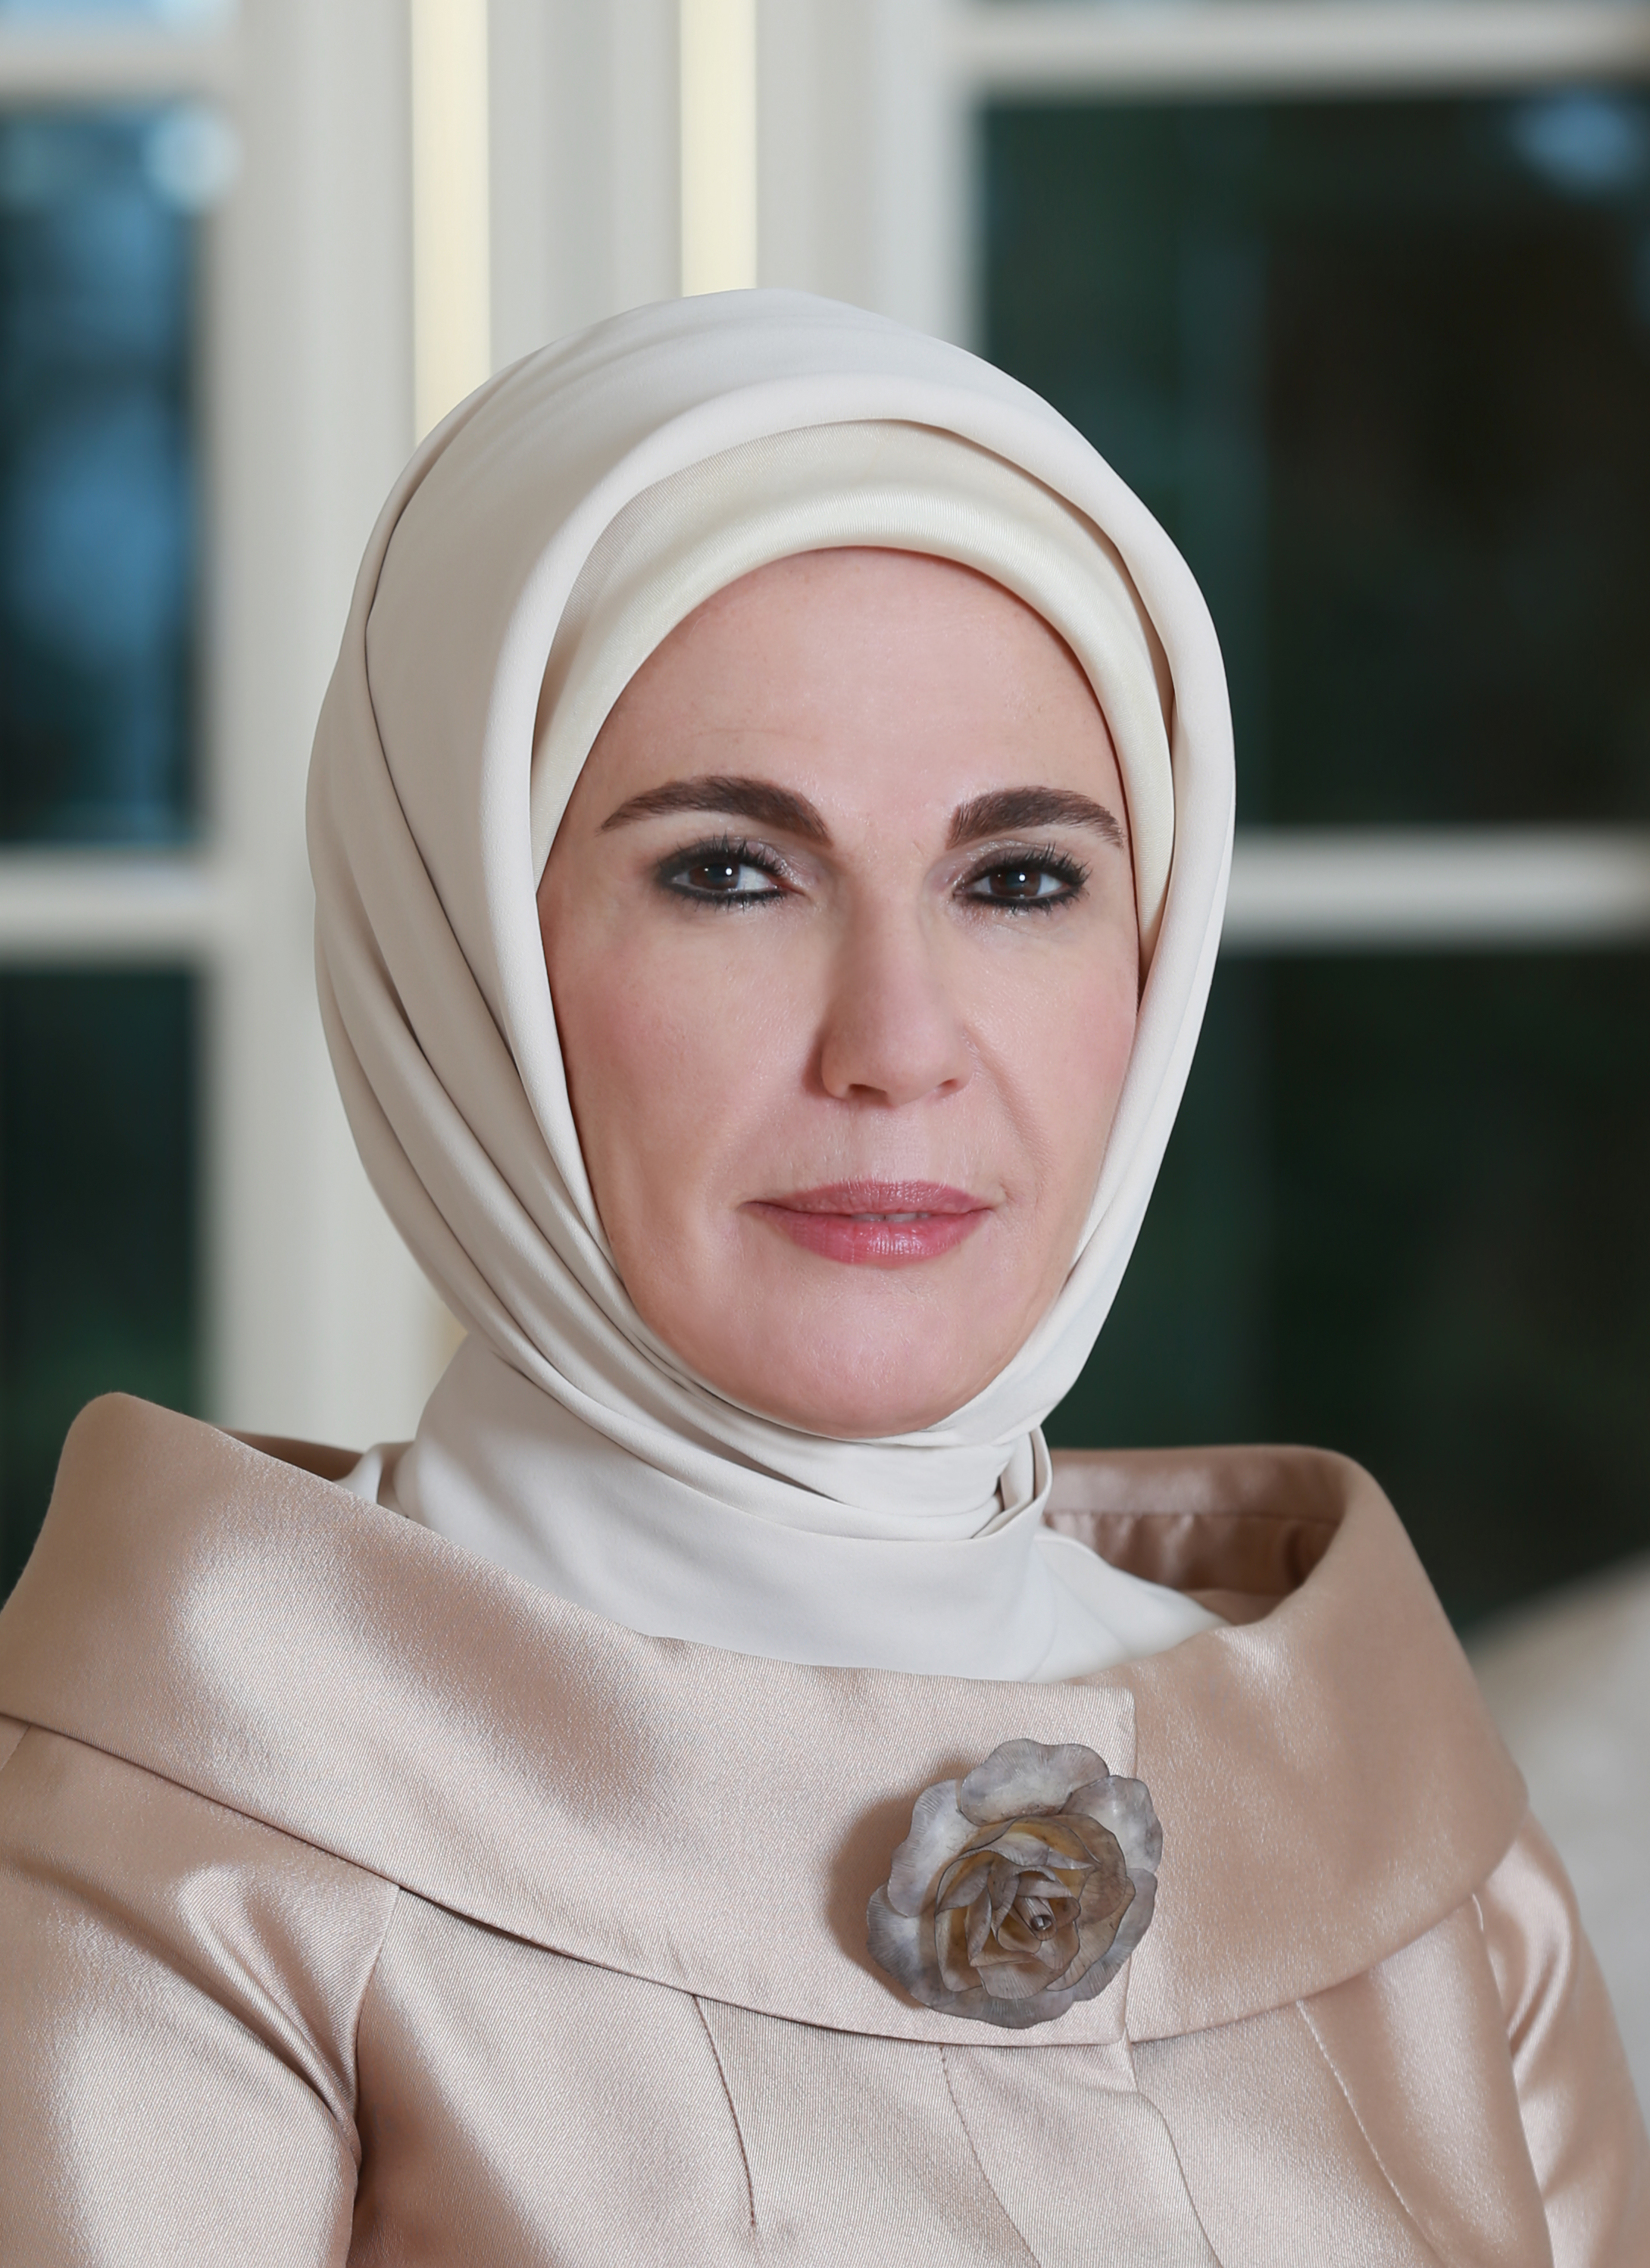 Emine Erdoğan - Wikipedia